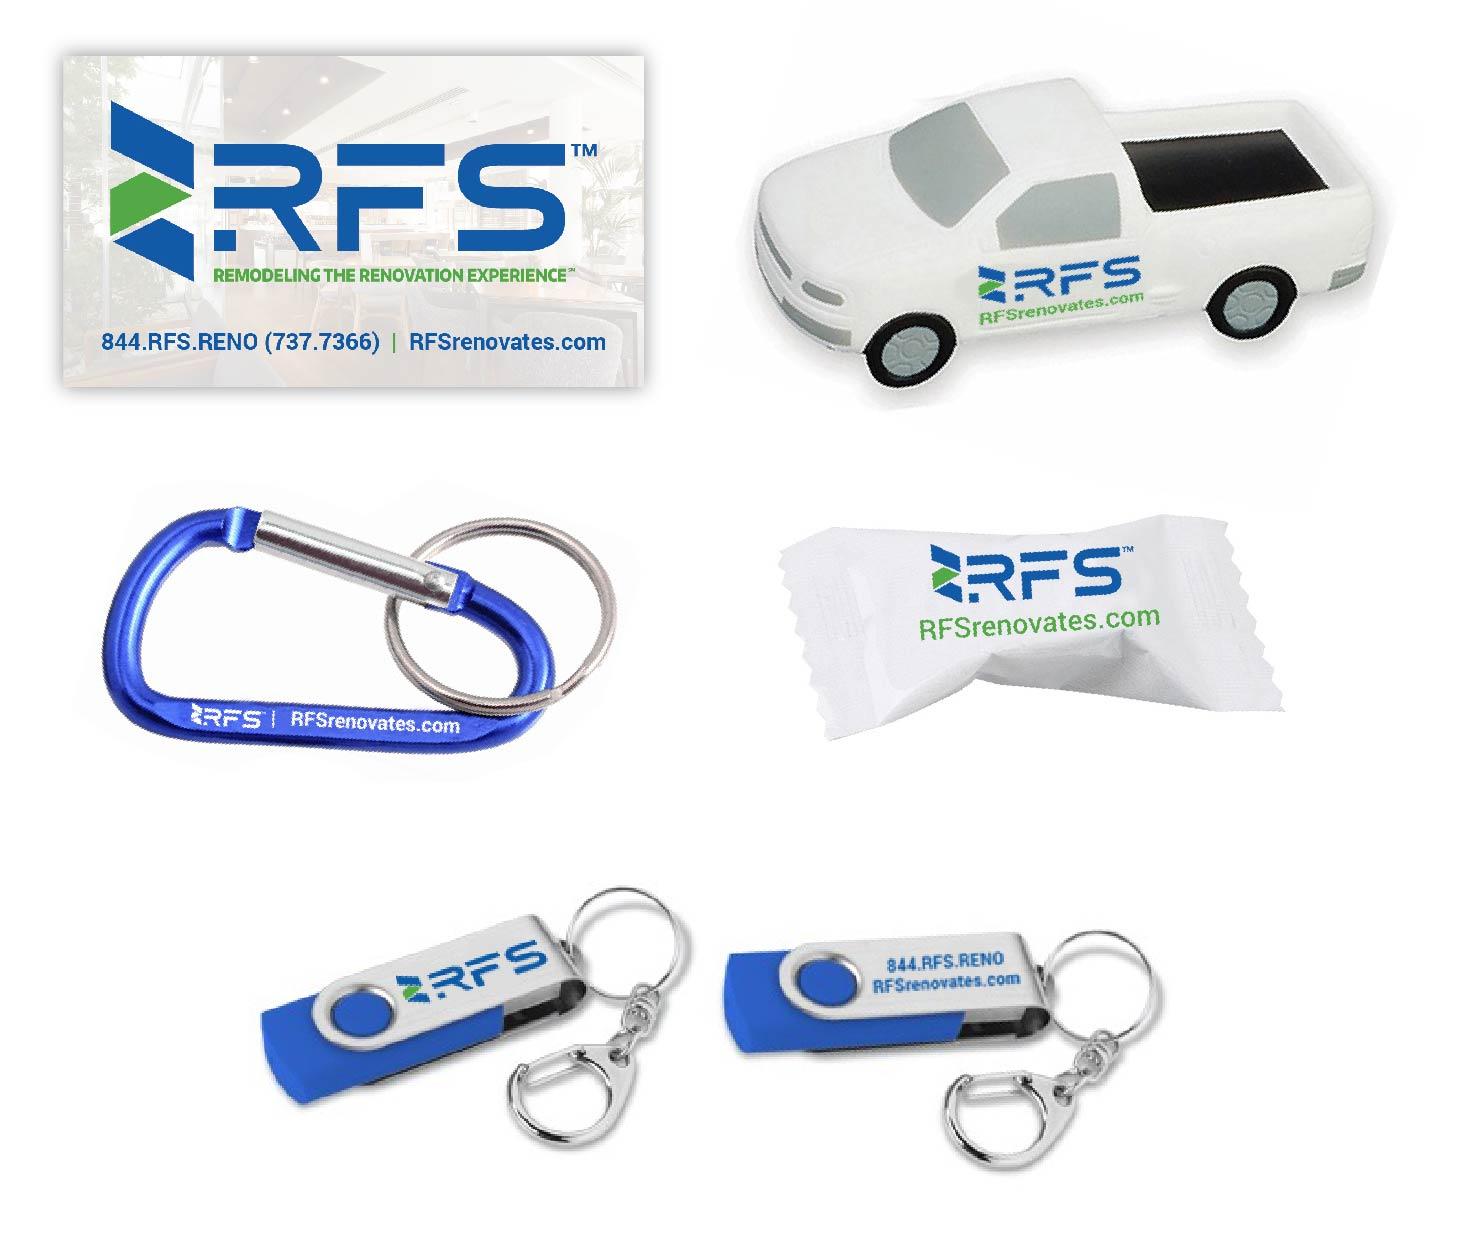 RFS logo on a business card, stress ball, caribiner, mint, and usb